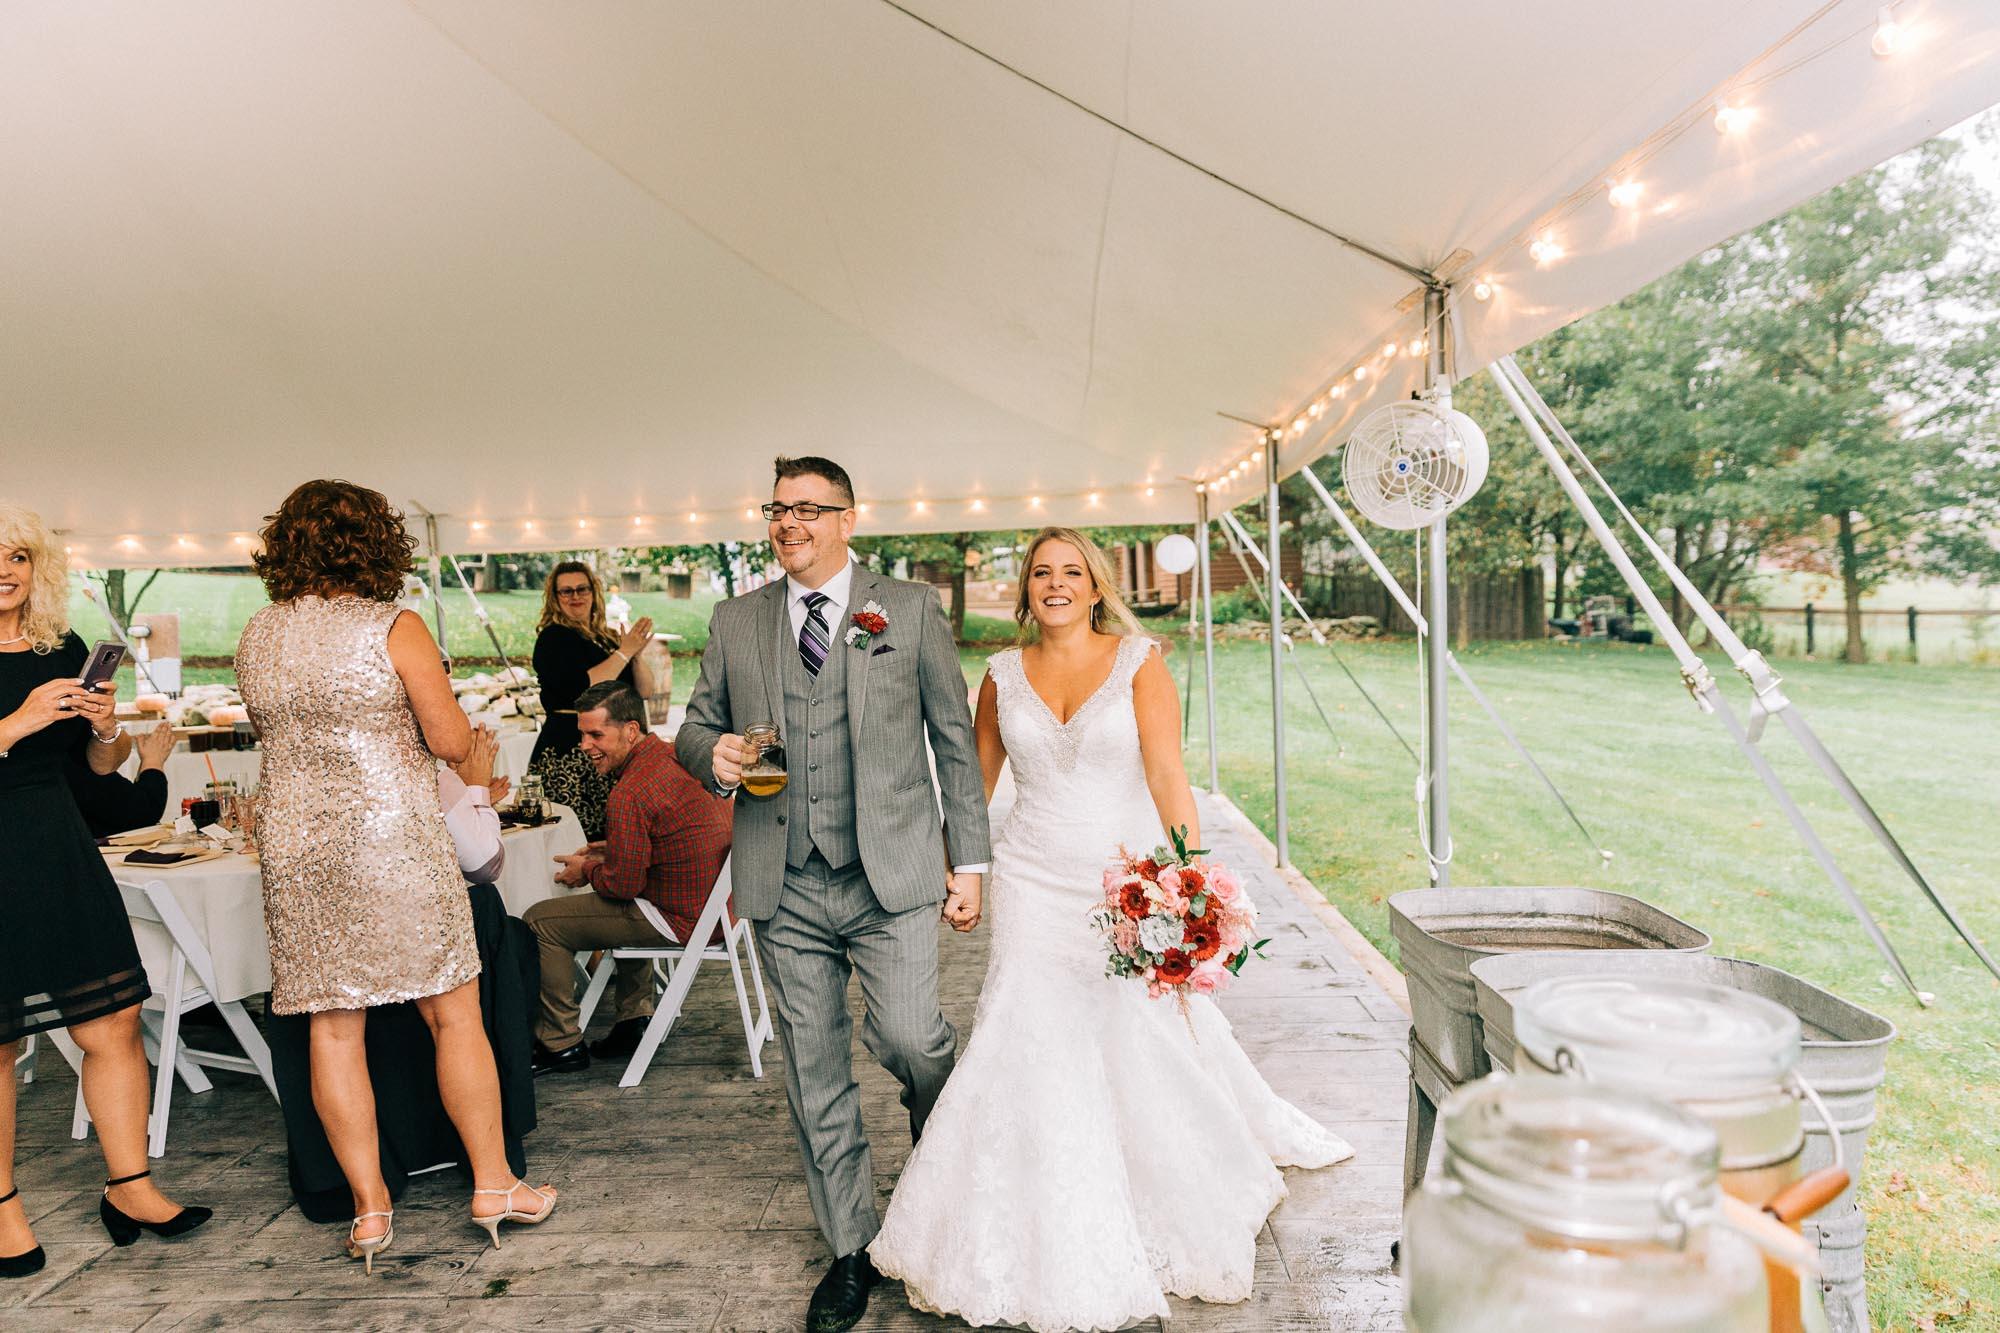 Lodge-at-Raven-Creek-October-wedding-63.jpg